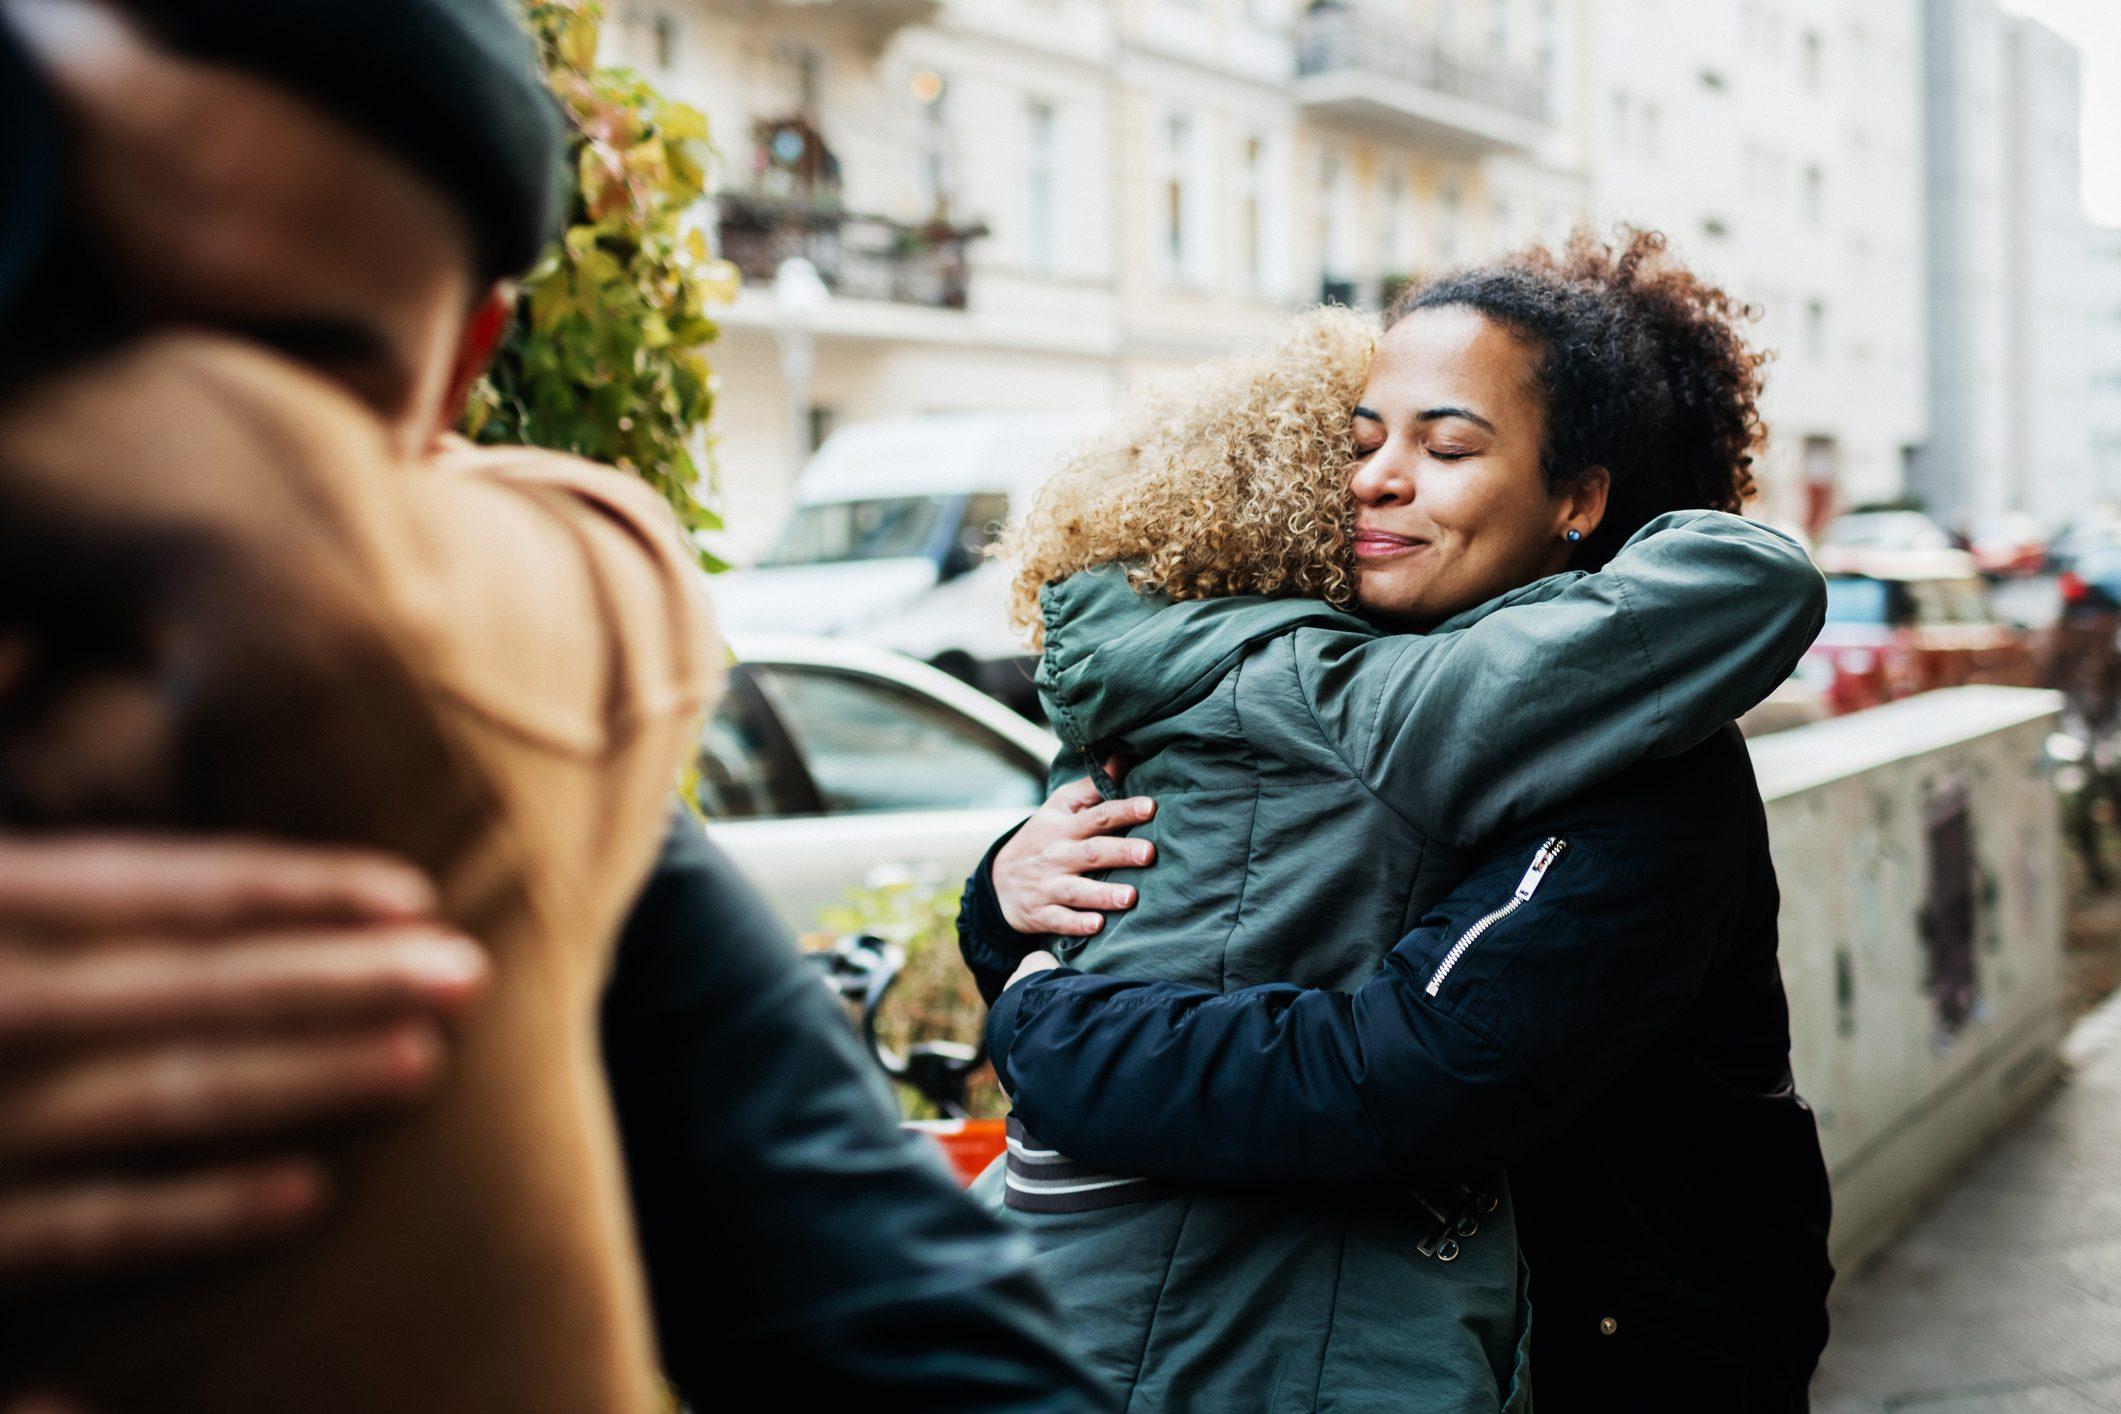 Friends Embracing In Street